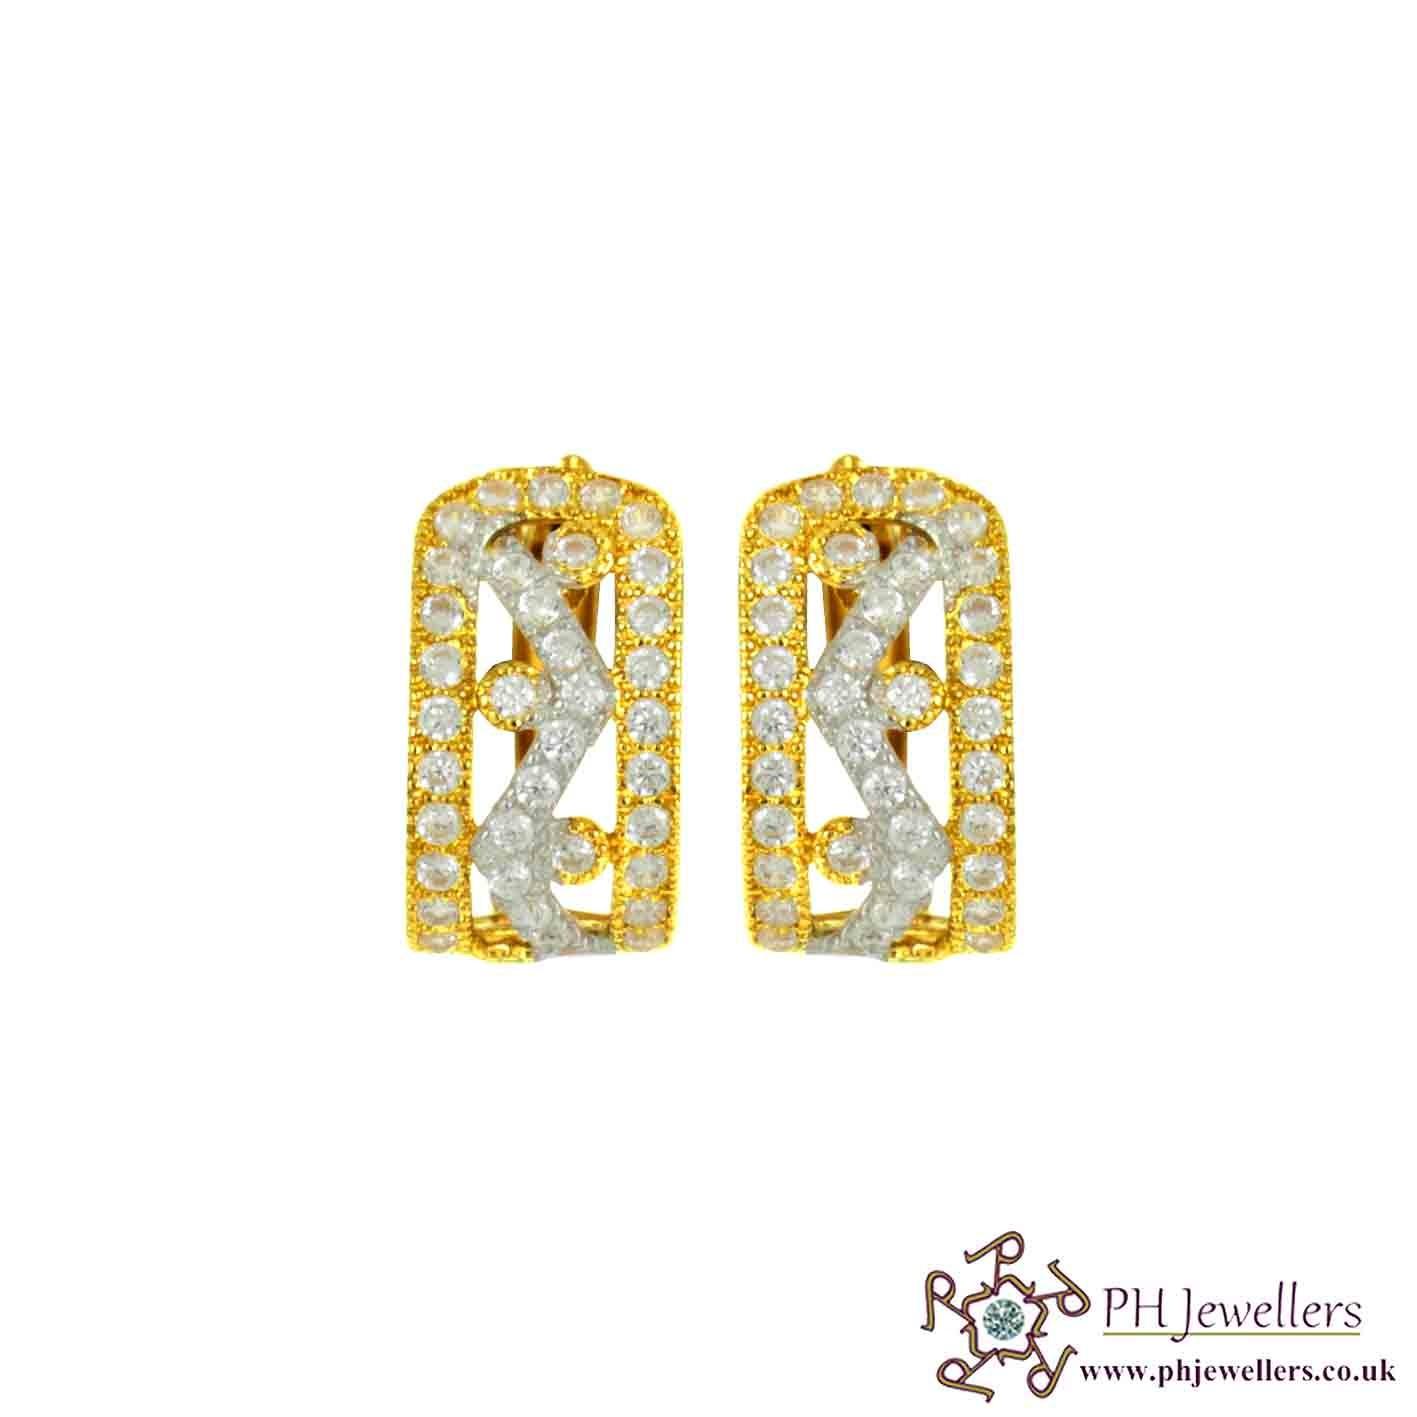 22ct 916 Hallmark Yellow Gold Clip-on Rhodium Earring CZ CE33